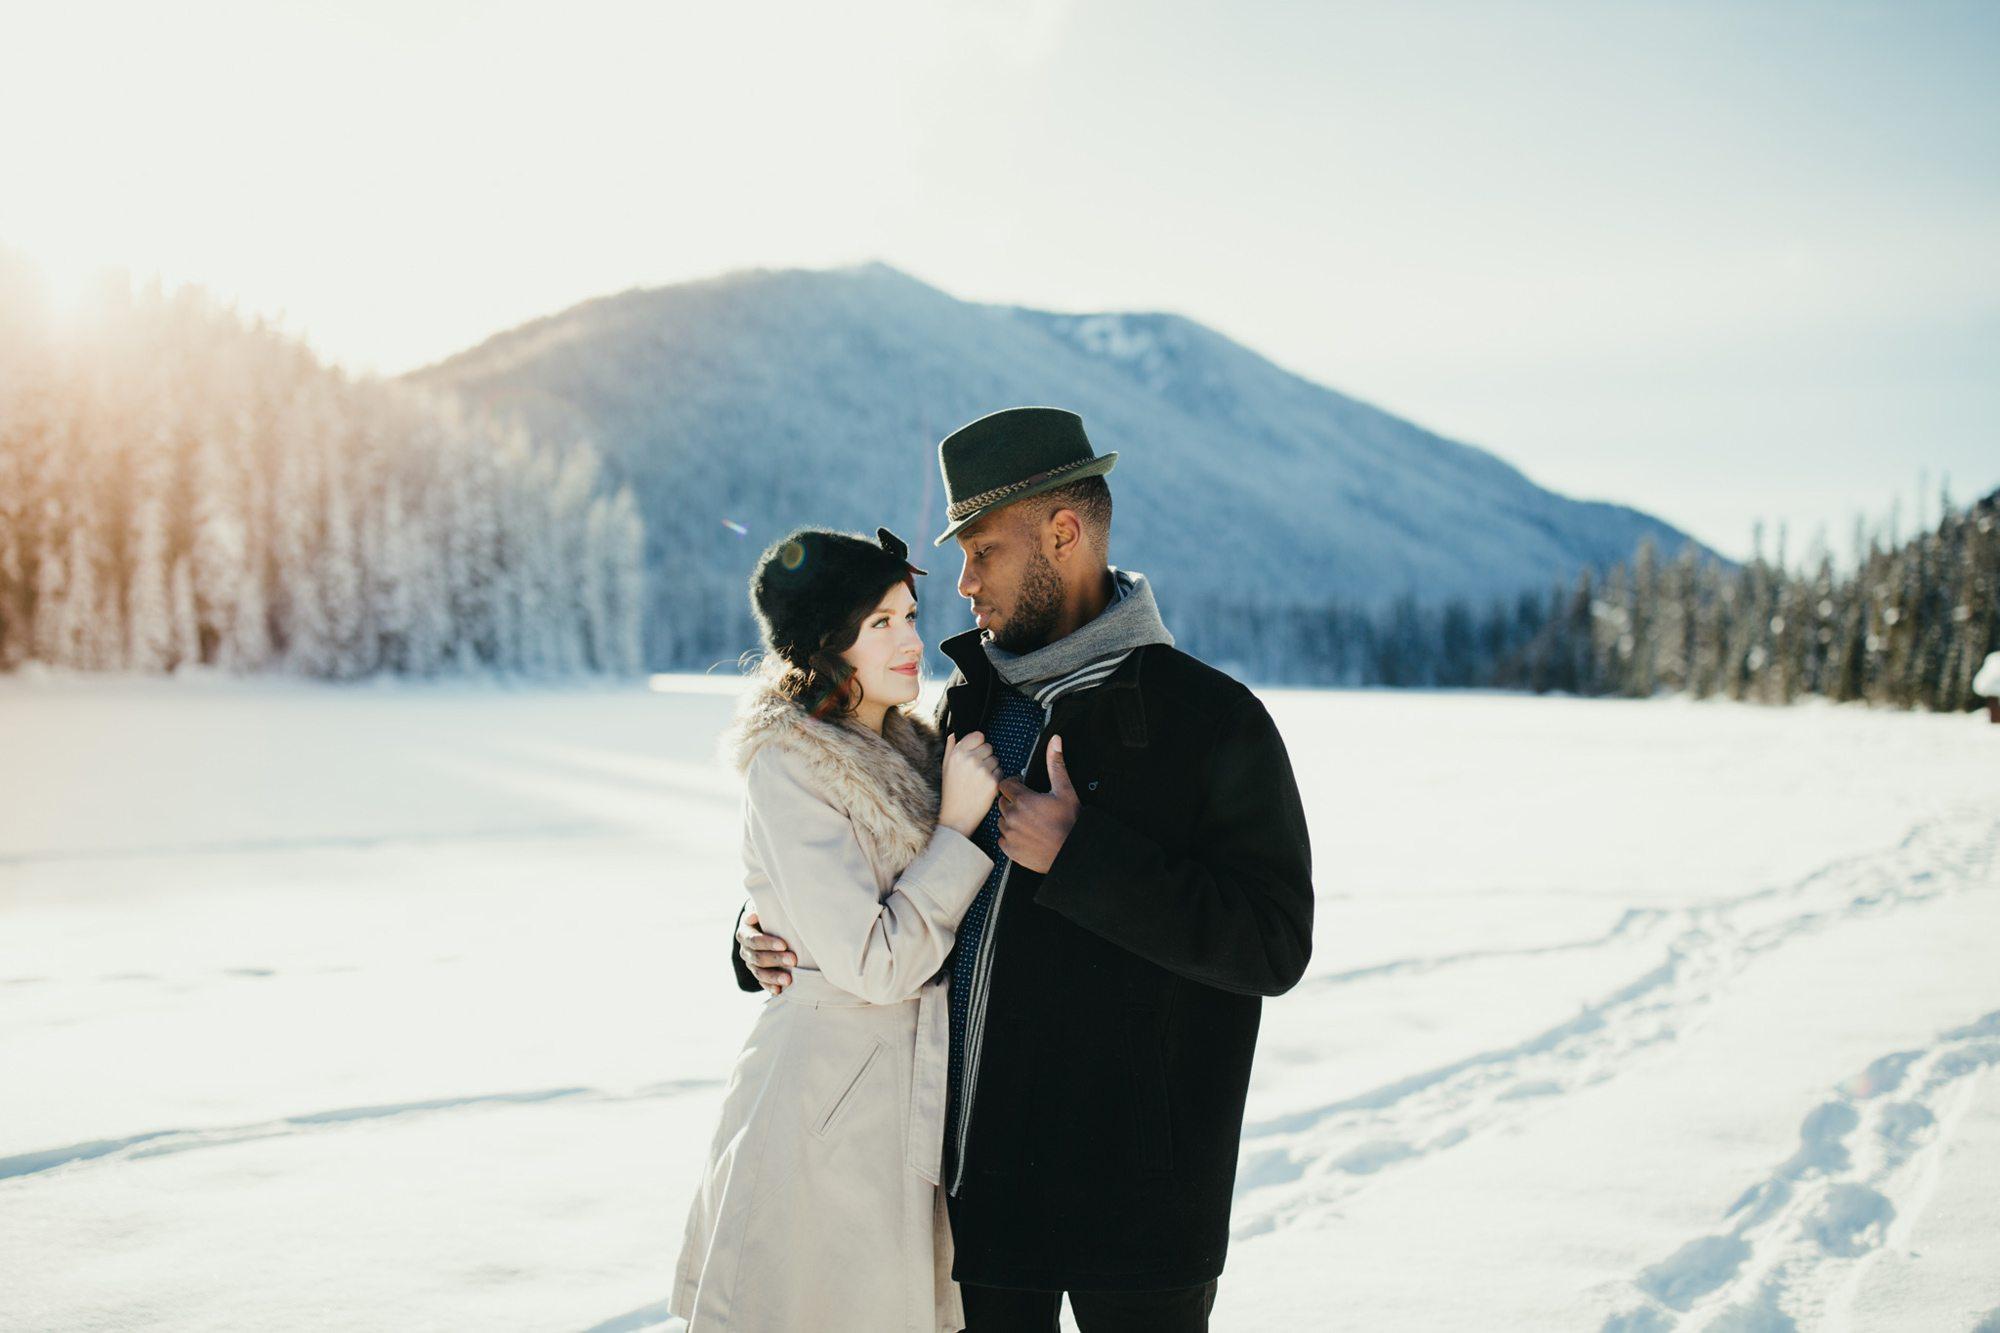 021-adventure-engagement-photographer